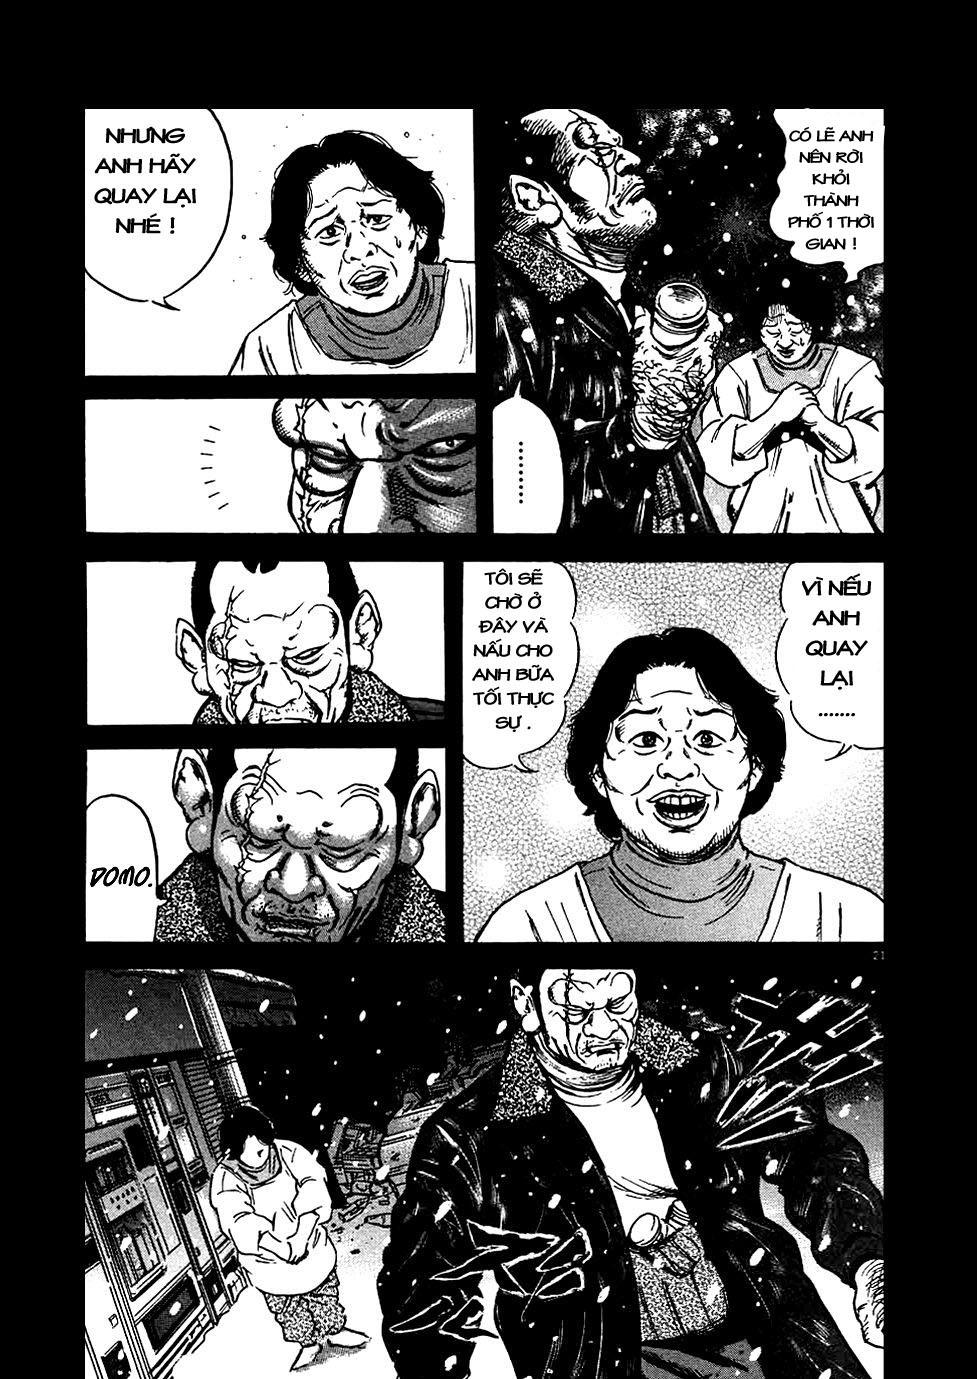 Oyaji chap 13 trang 21